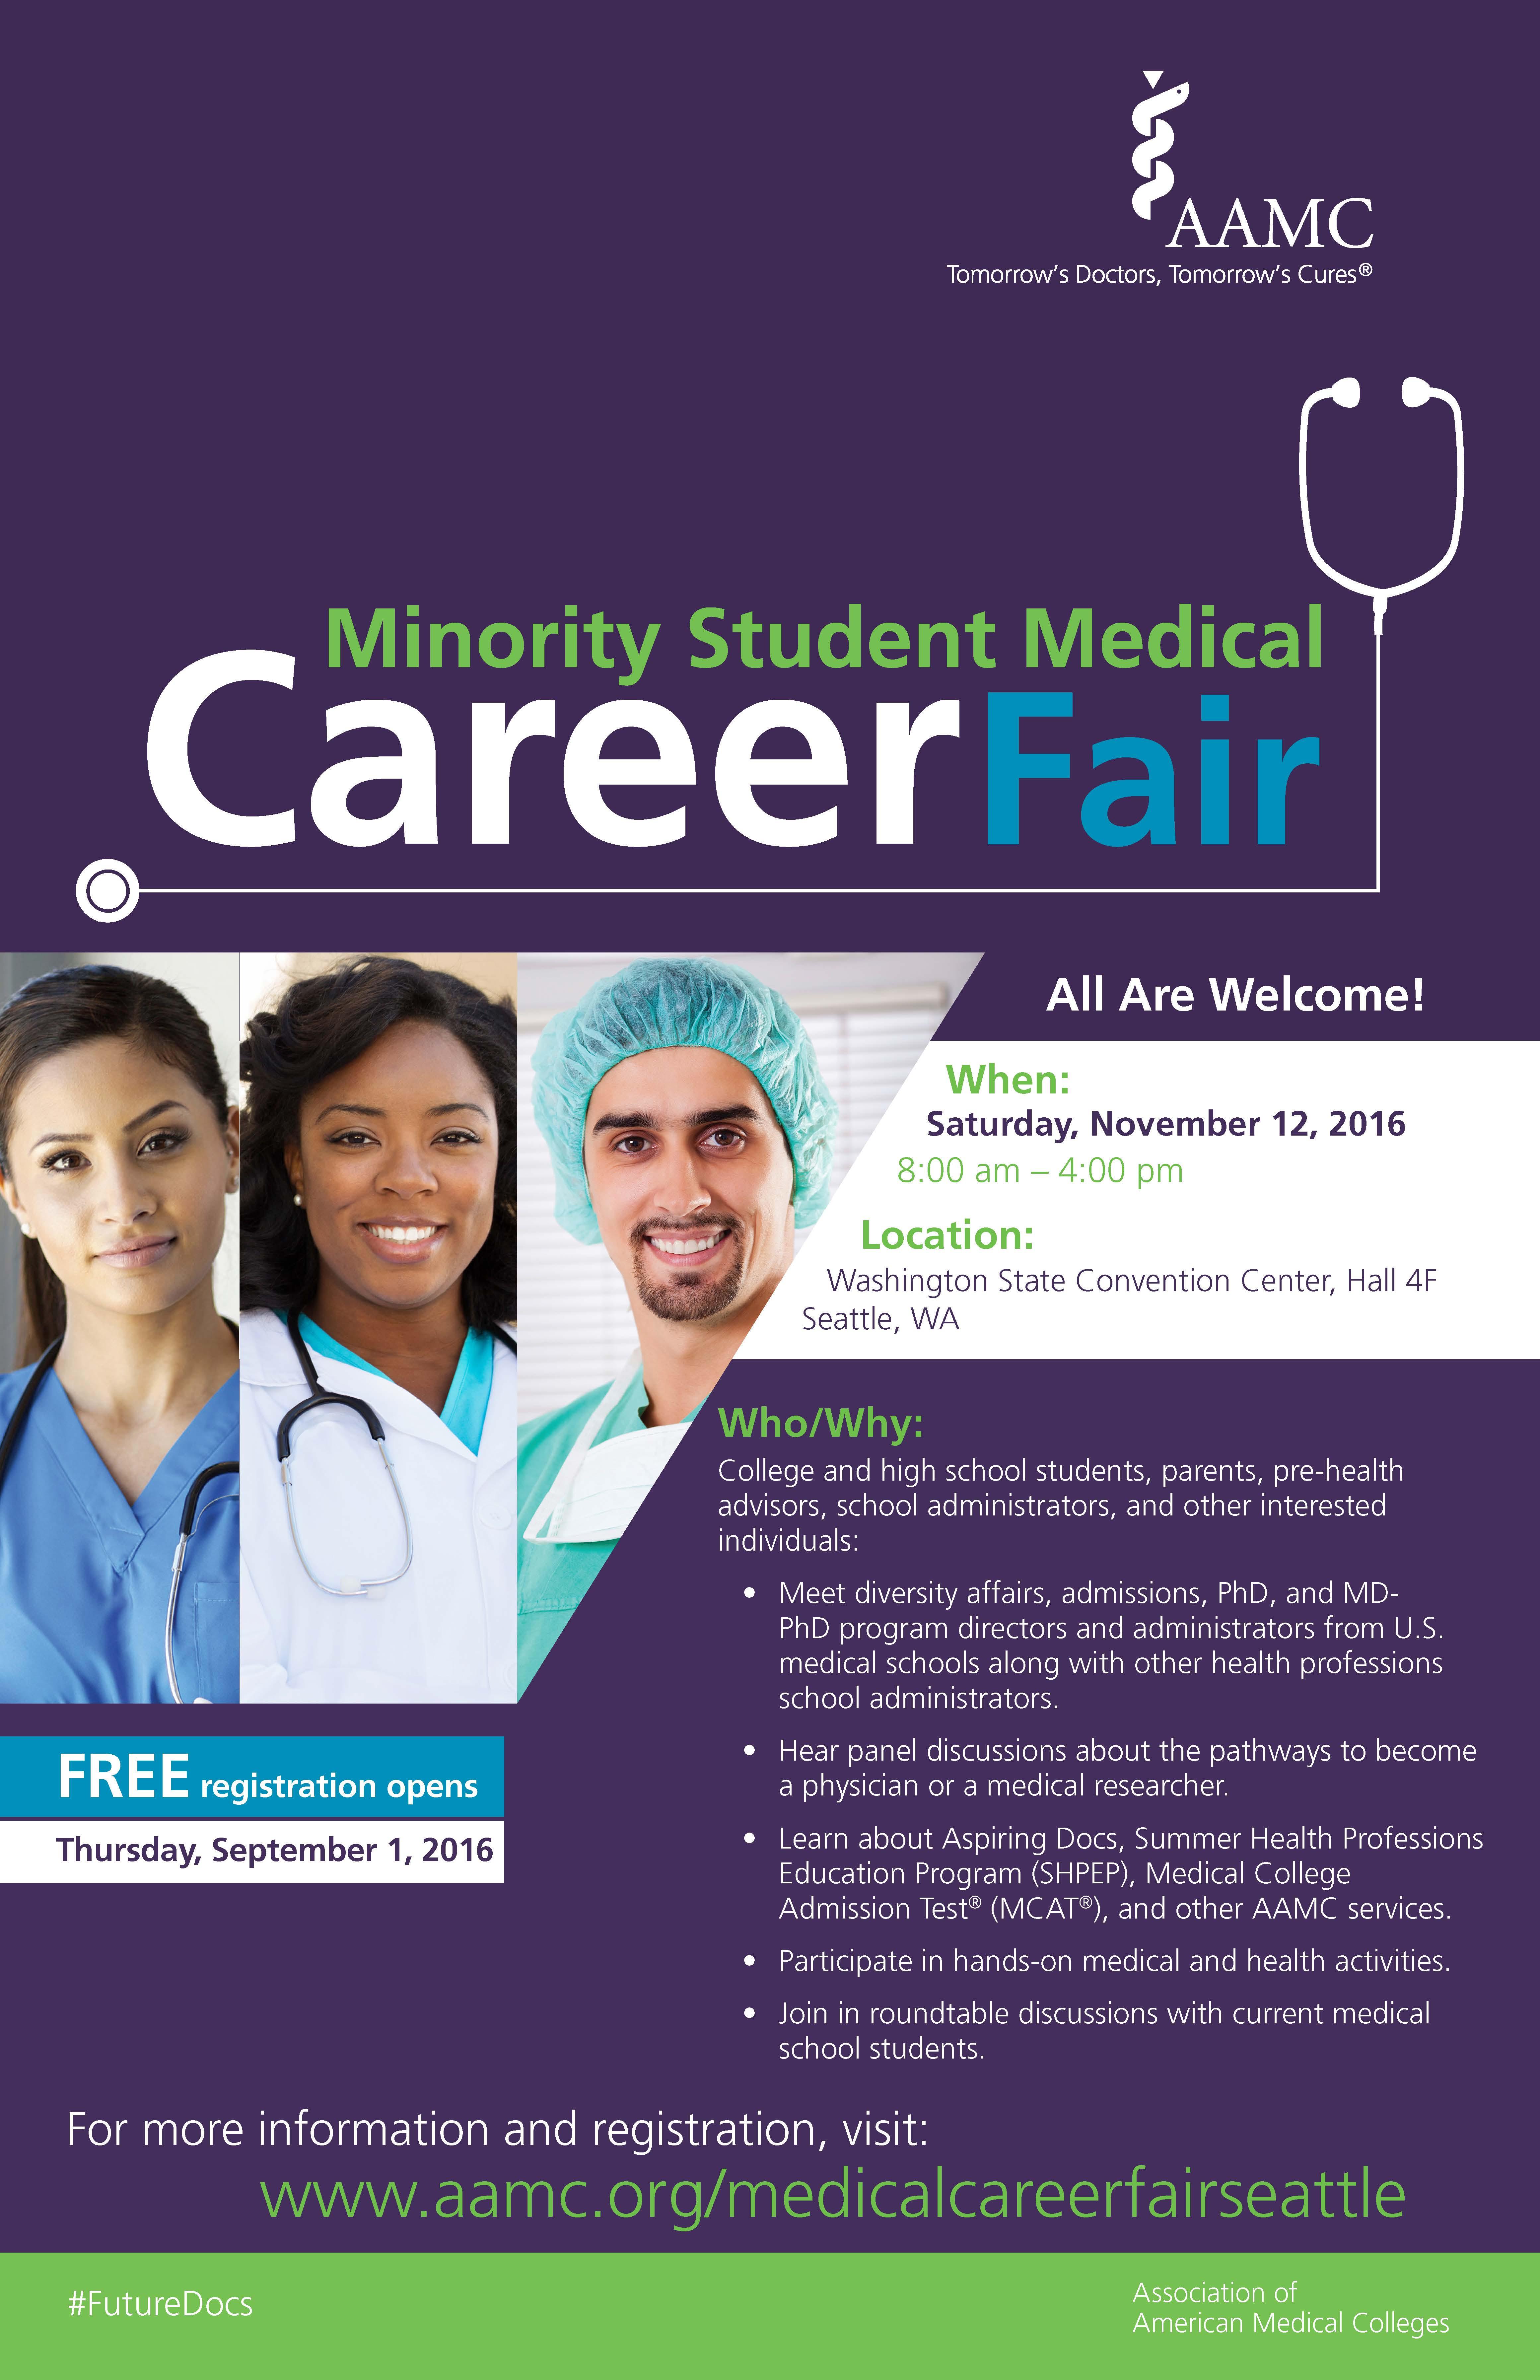 AAMC Career Fair Focuses on Minority Doctors